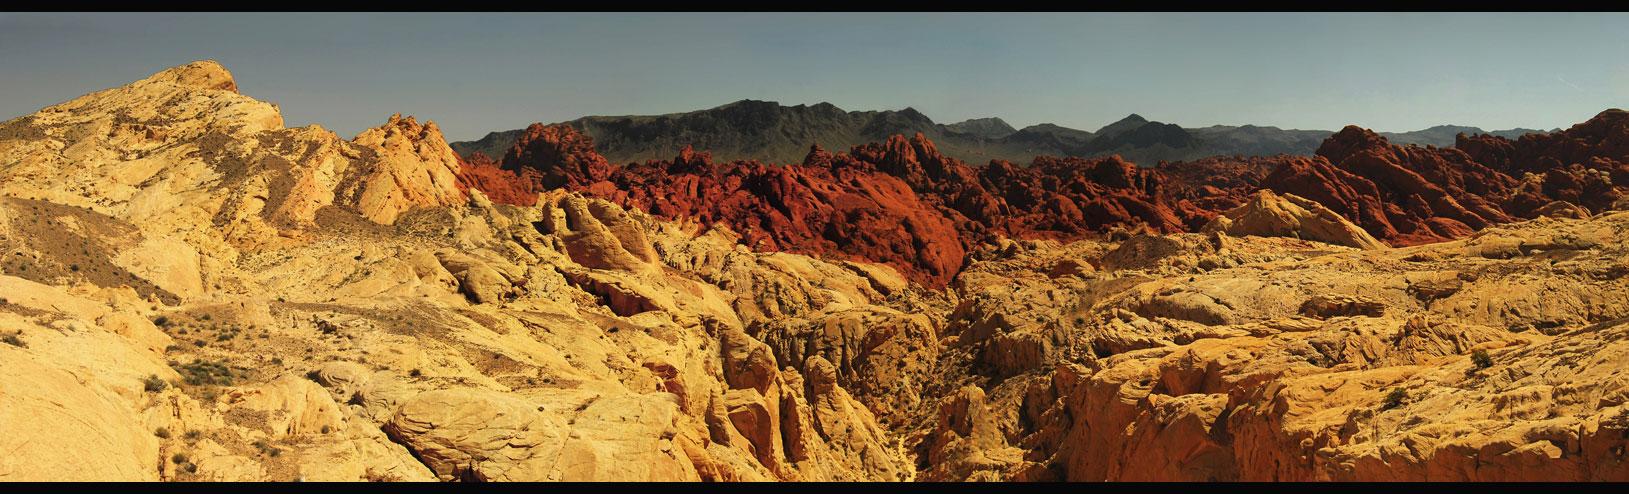 Fire Canyon - schwarz, rot, gold